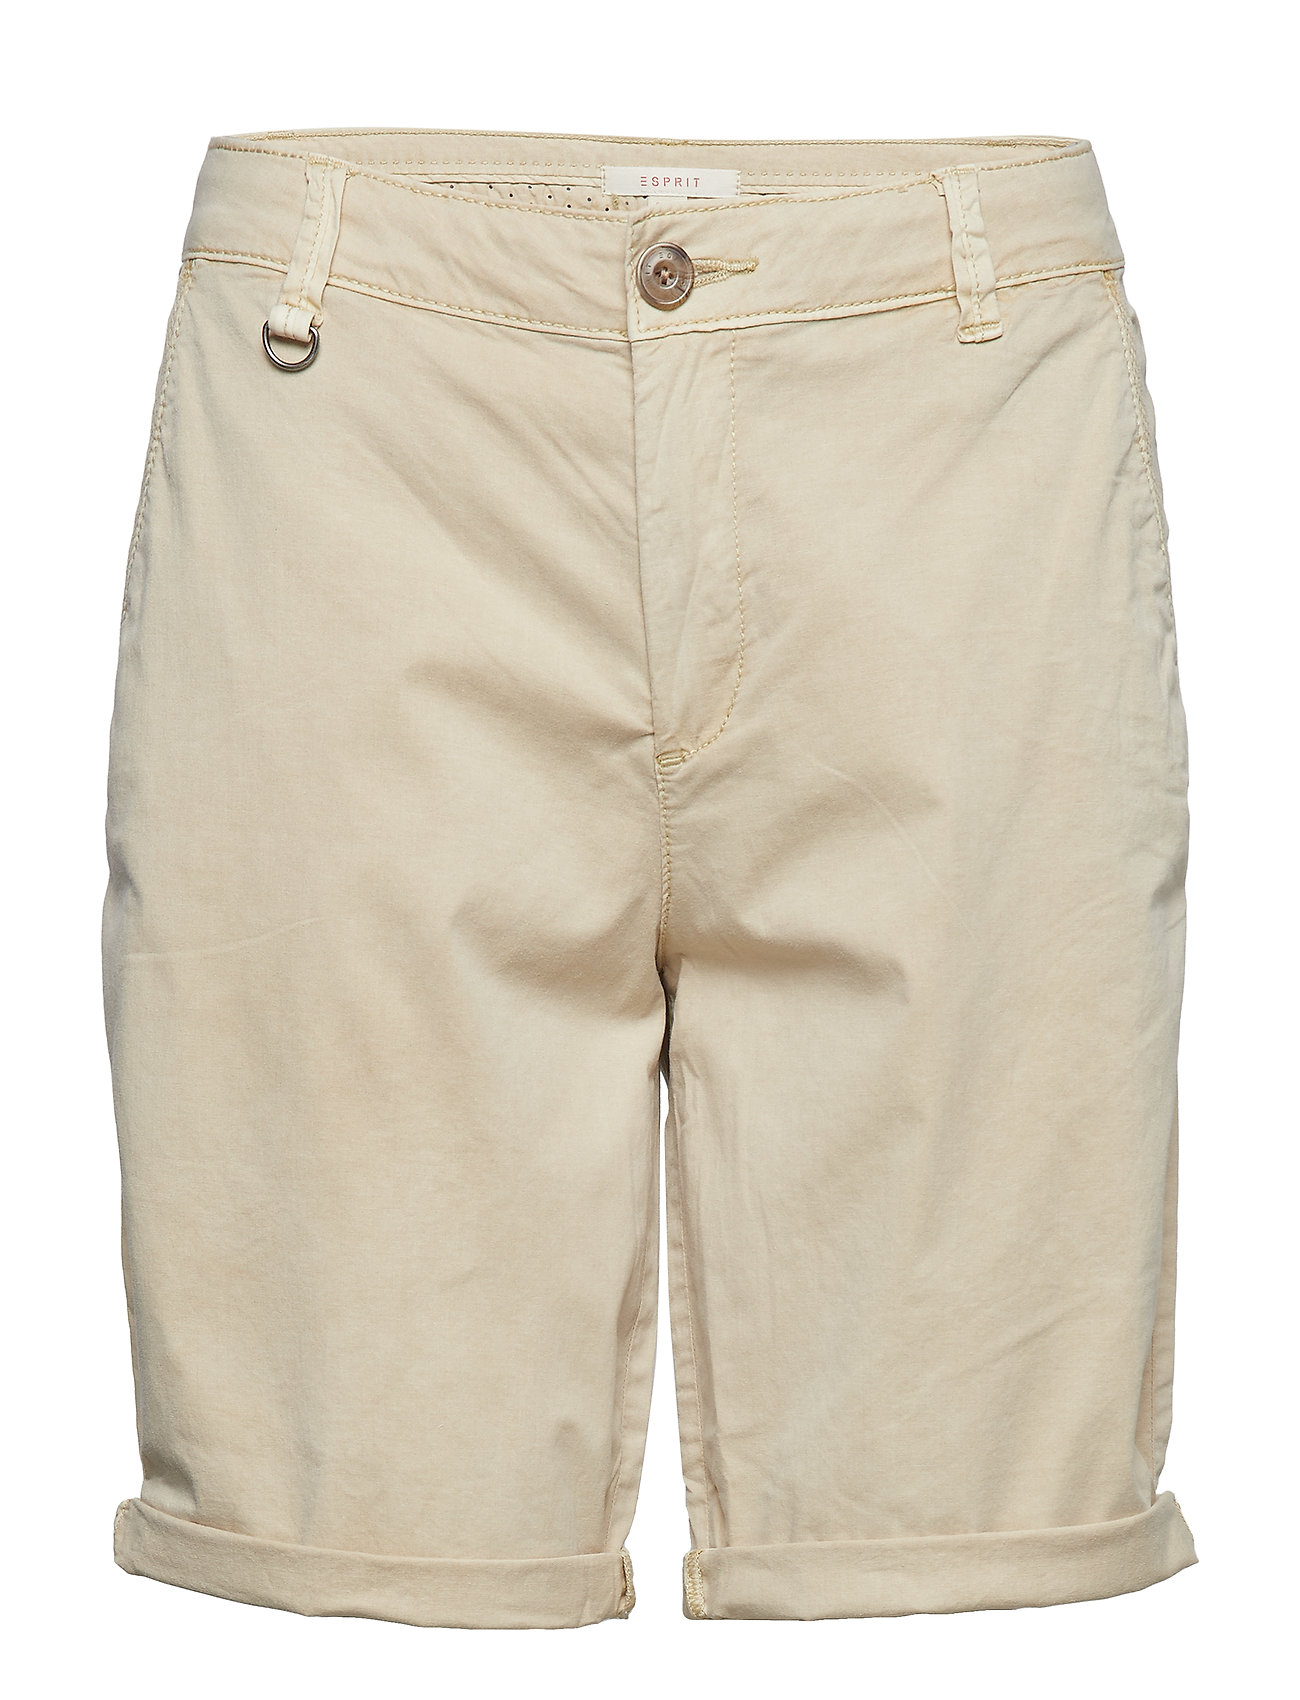 Esprit Casual Shorts woven - LIGHT BEIGE